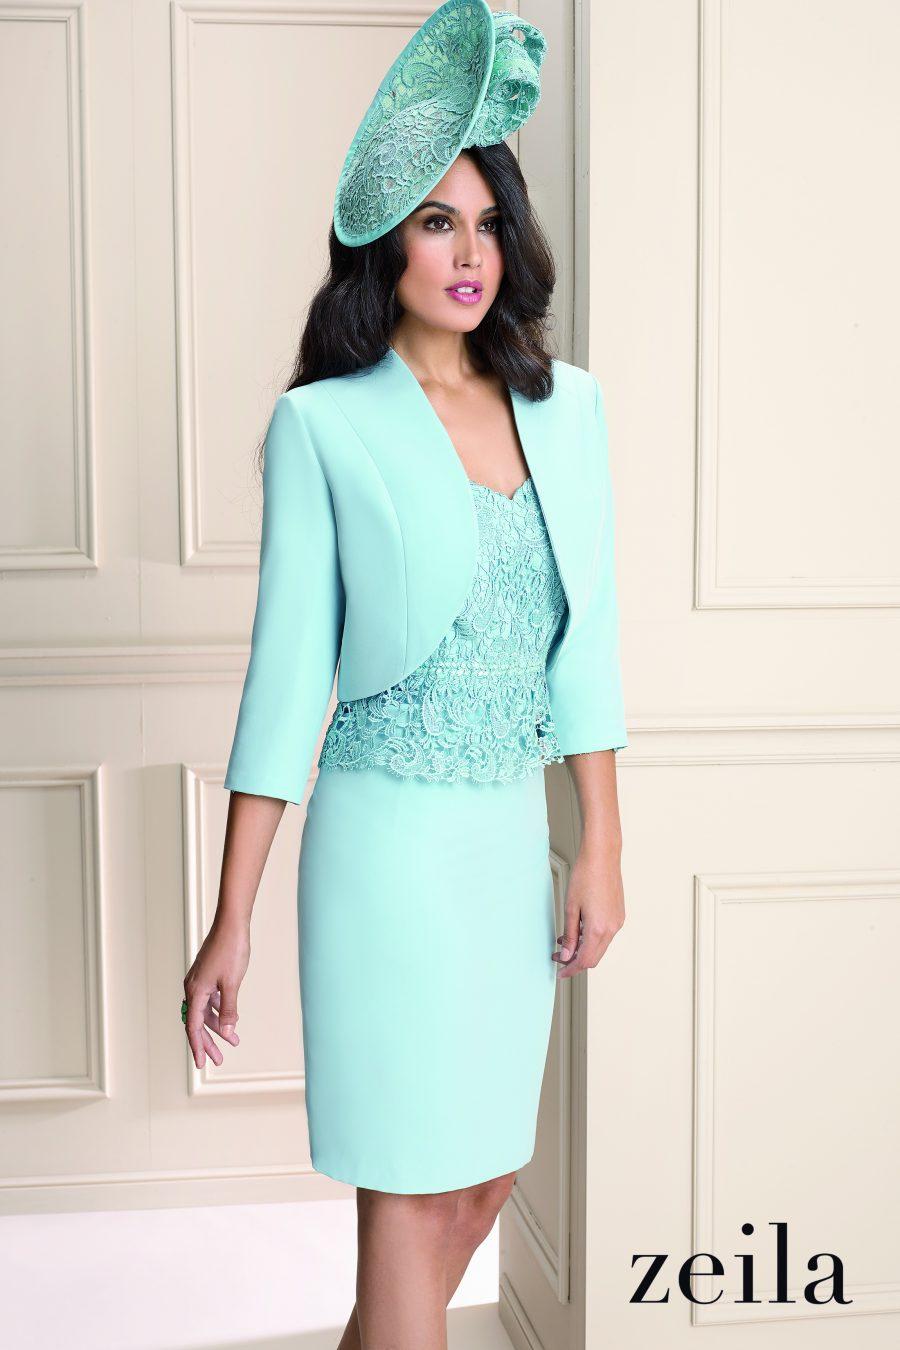 Zeila Occasion wear